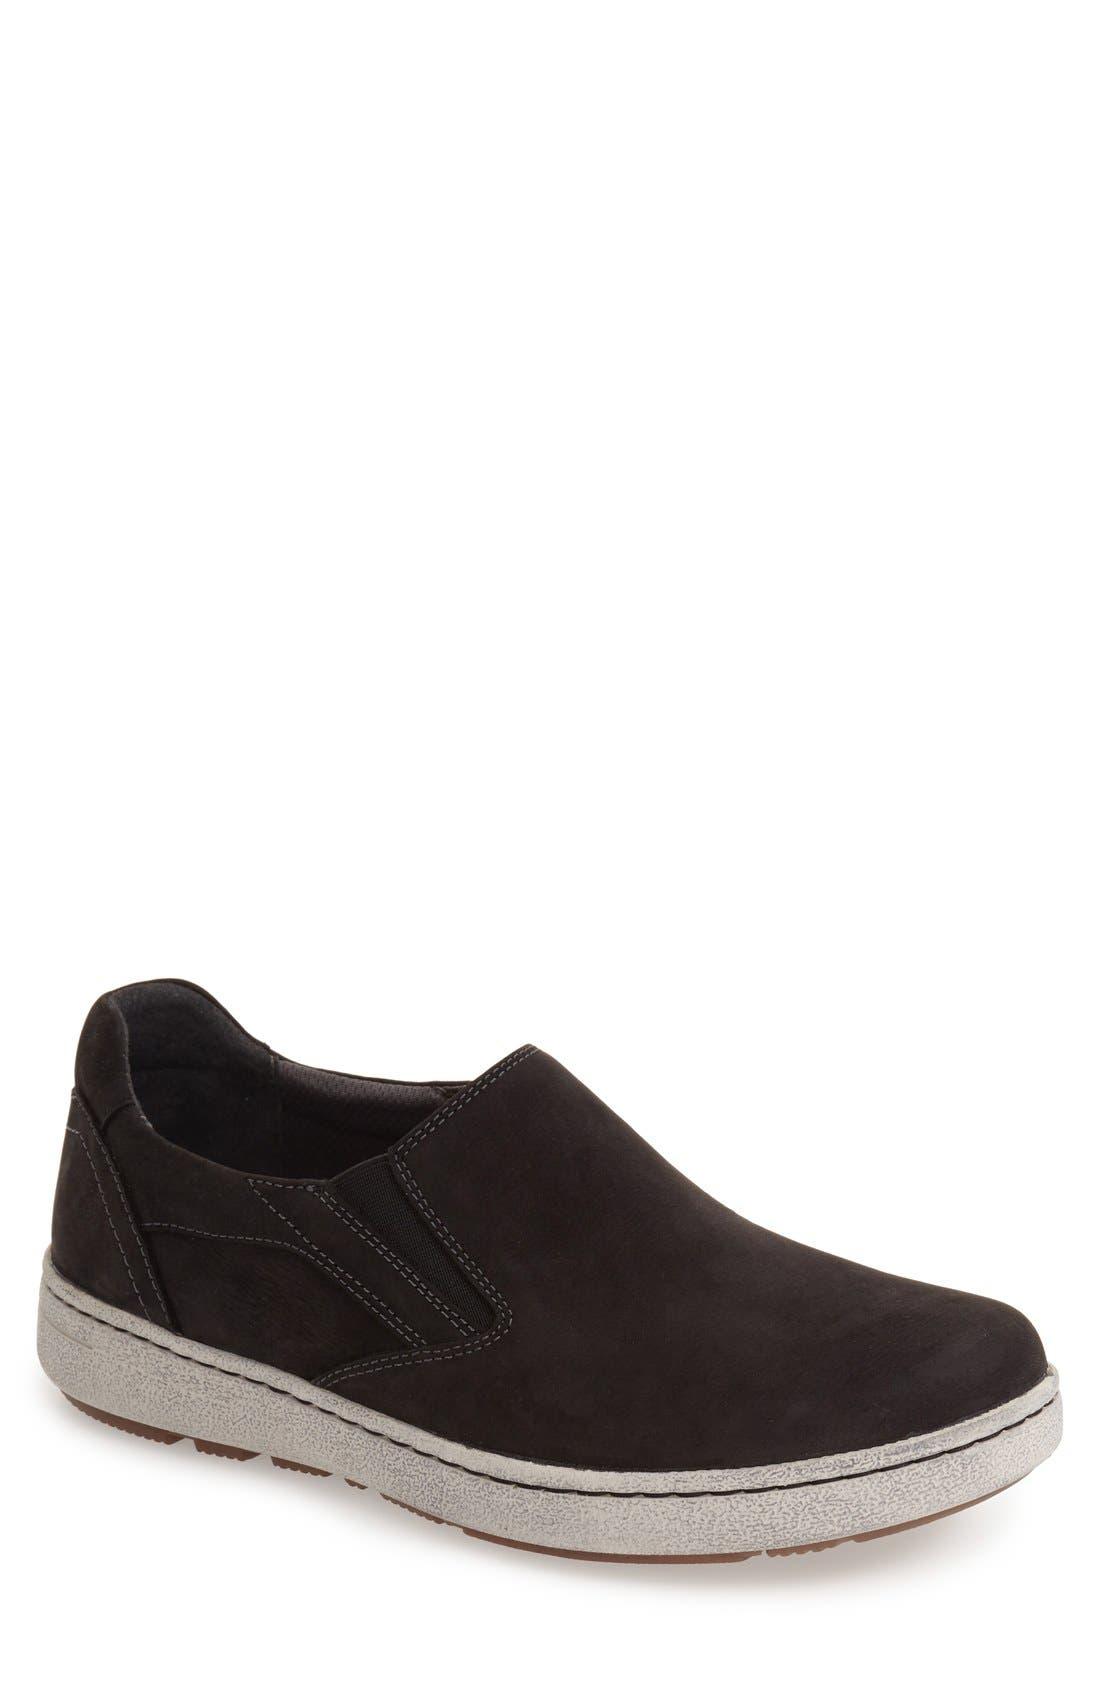 DANSKO 'Viktor' Water Resistant Slip-On Sneaker, Main, color, BLACK MILLED NUBUCK LEATHER